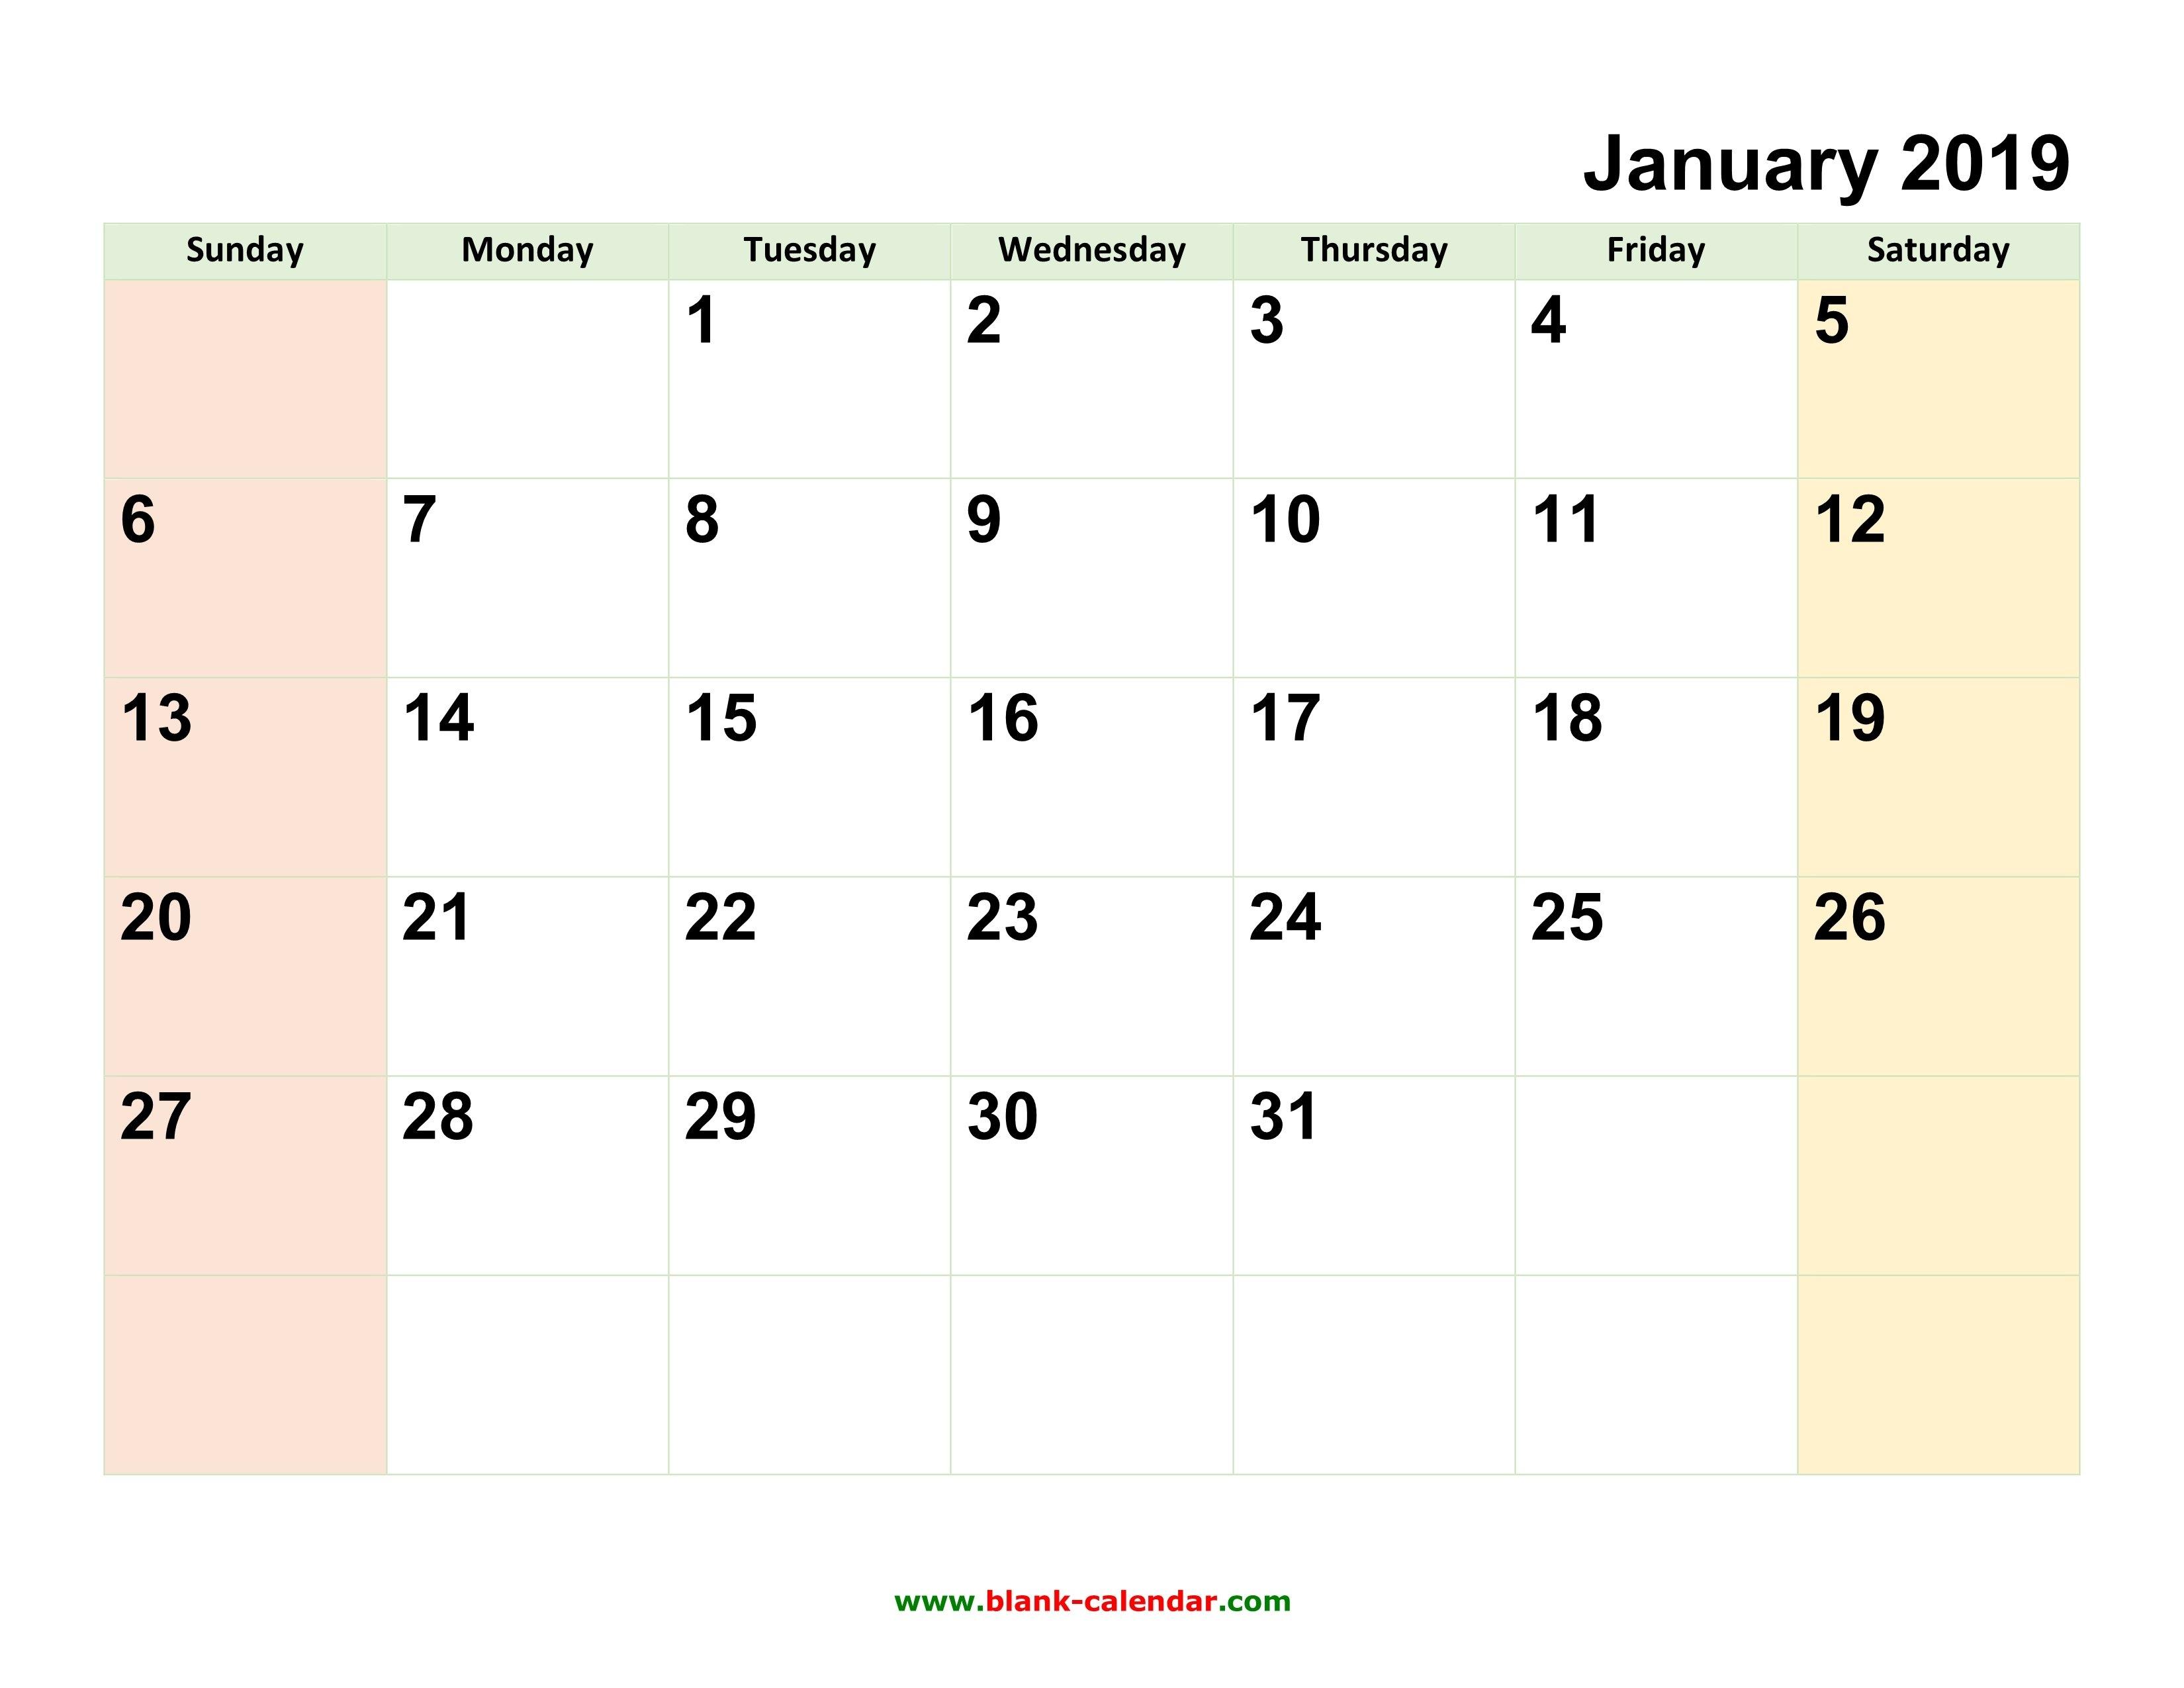 Monthly Calendar 2019 | Free Download, Editable And Printable Calendar 2019 Editable Word